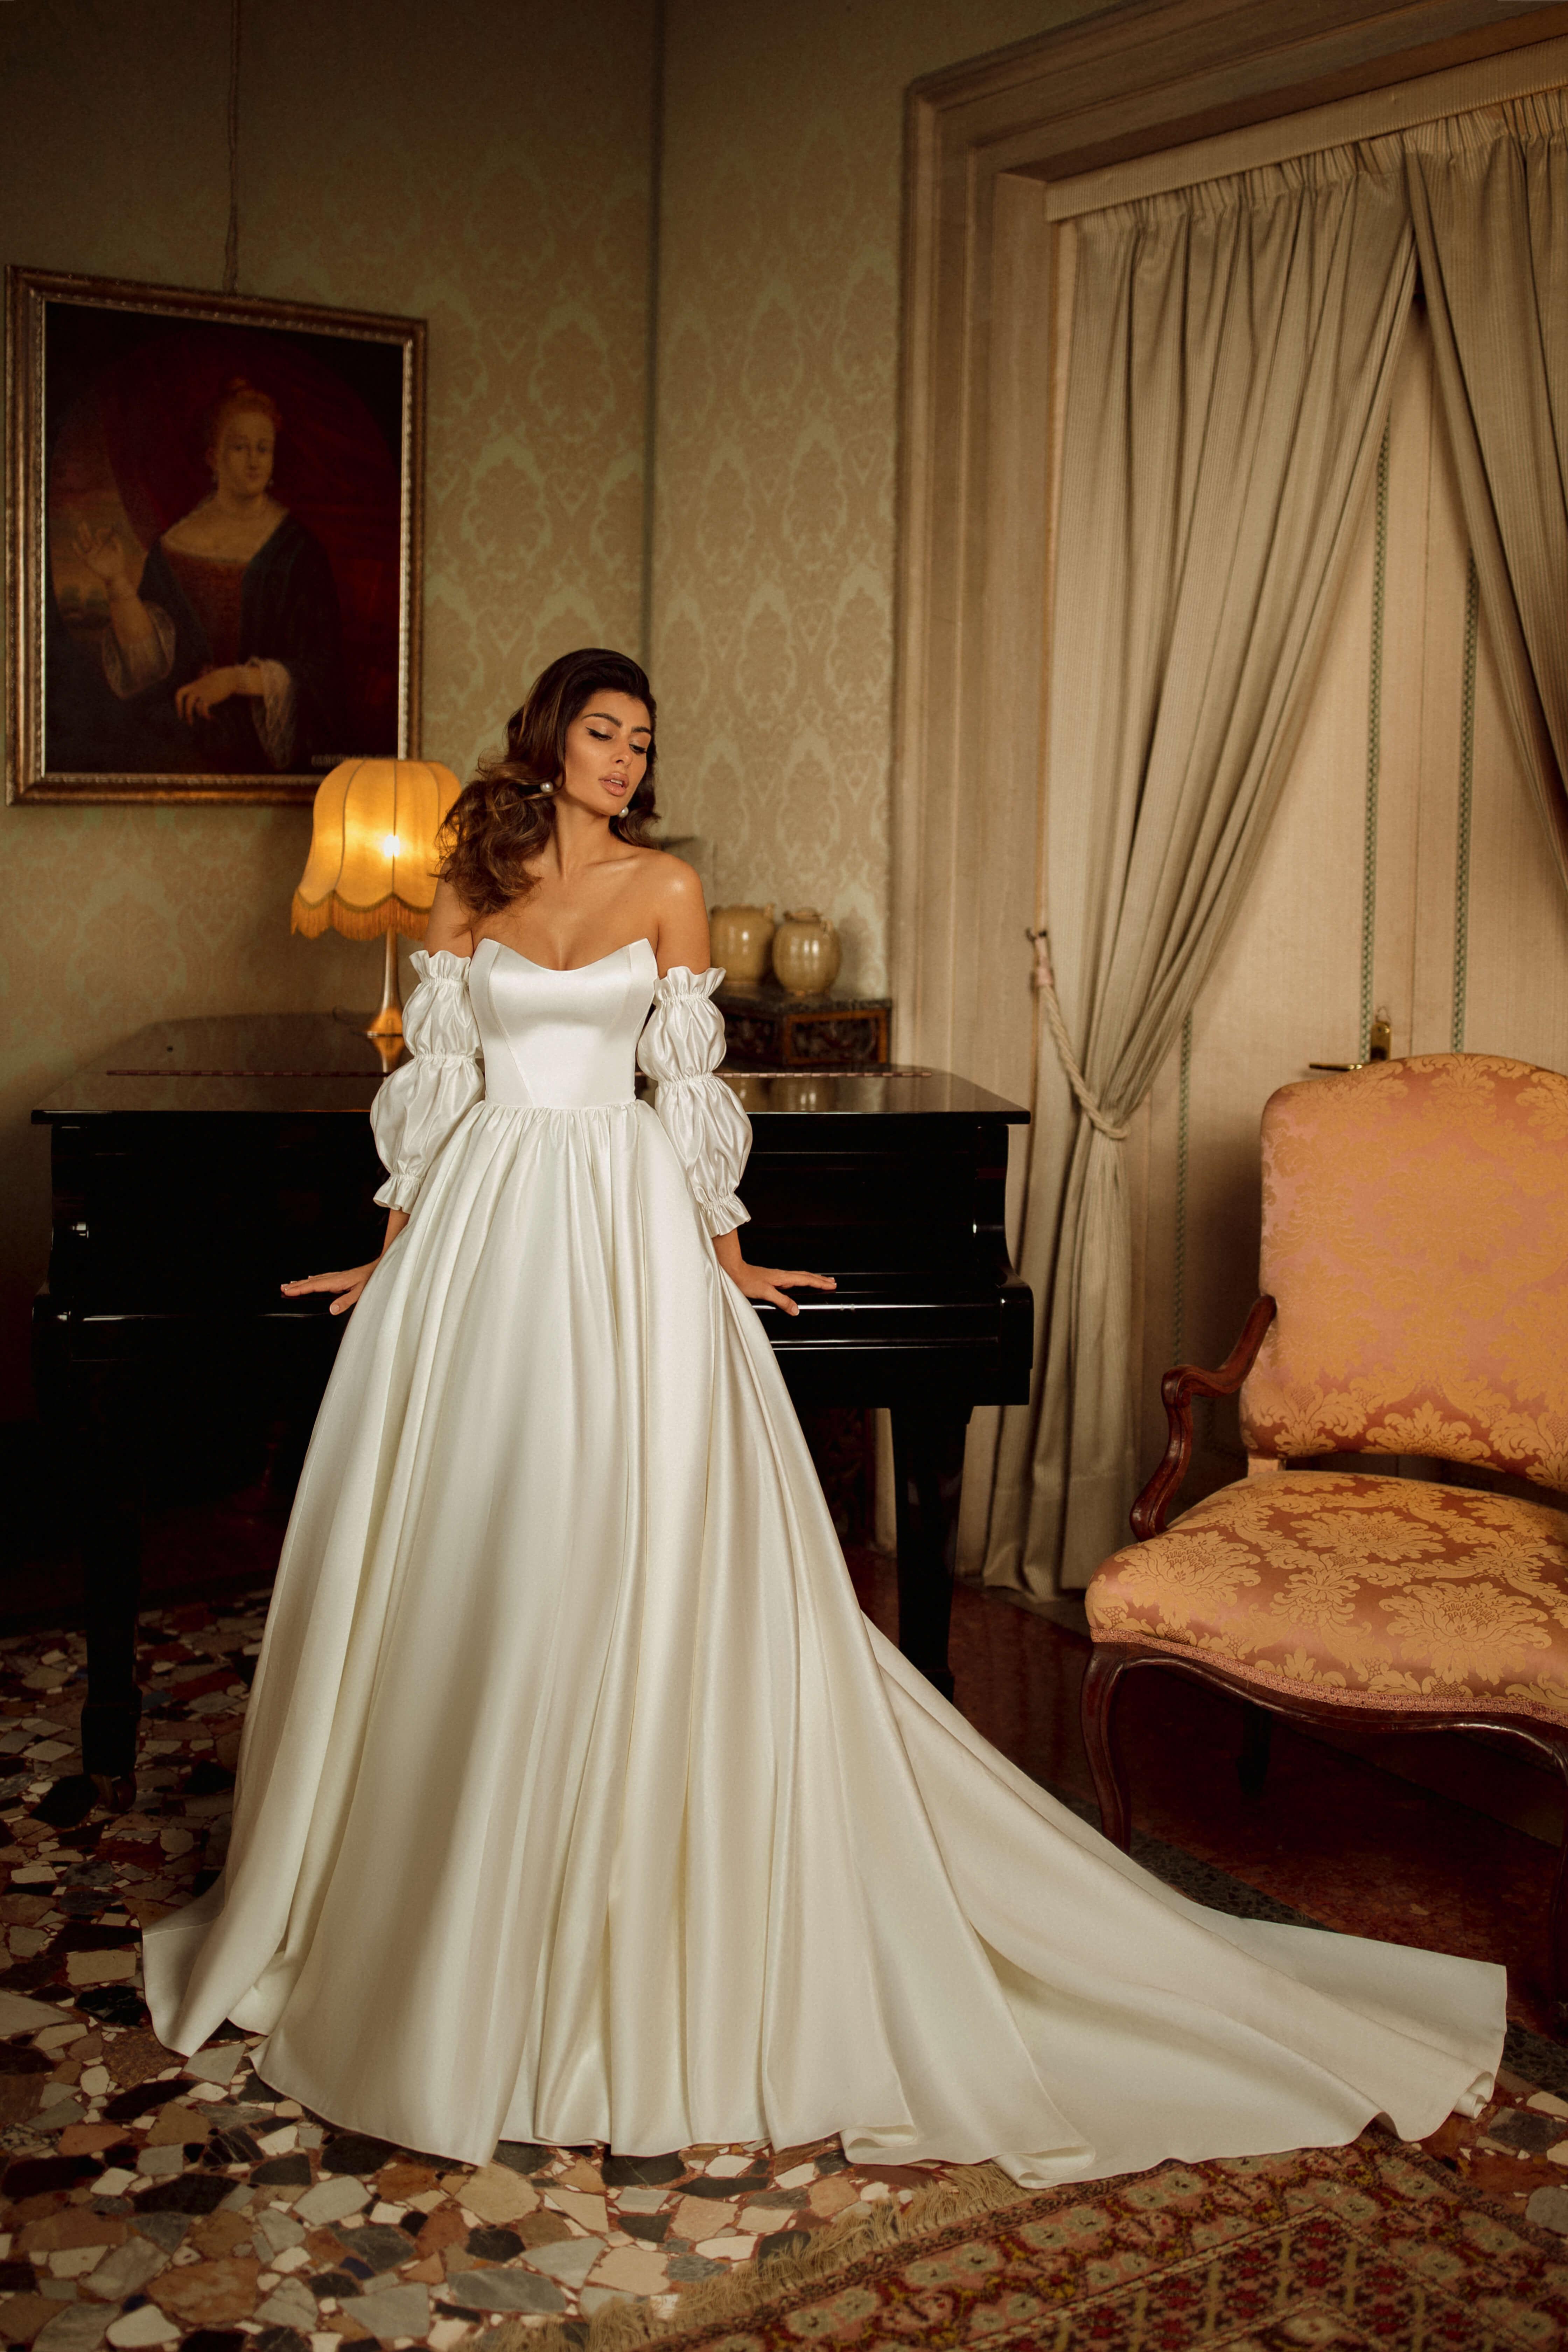 buy a wedding dress in the salon Blonde & Bride